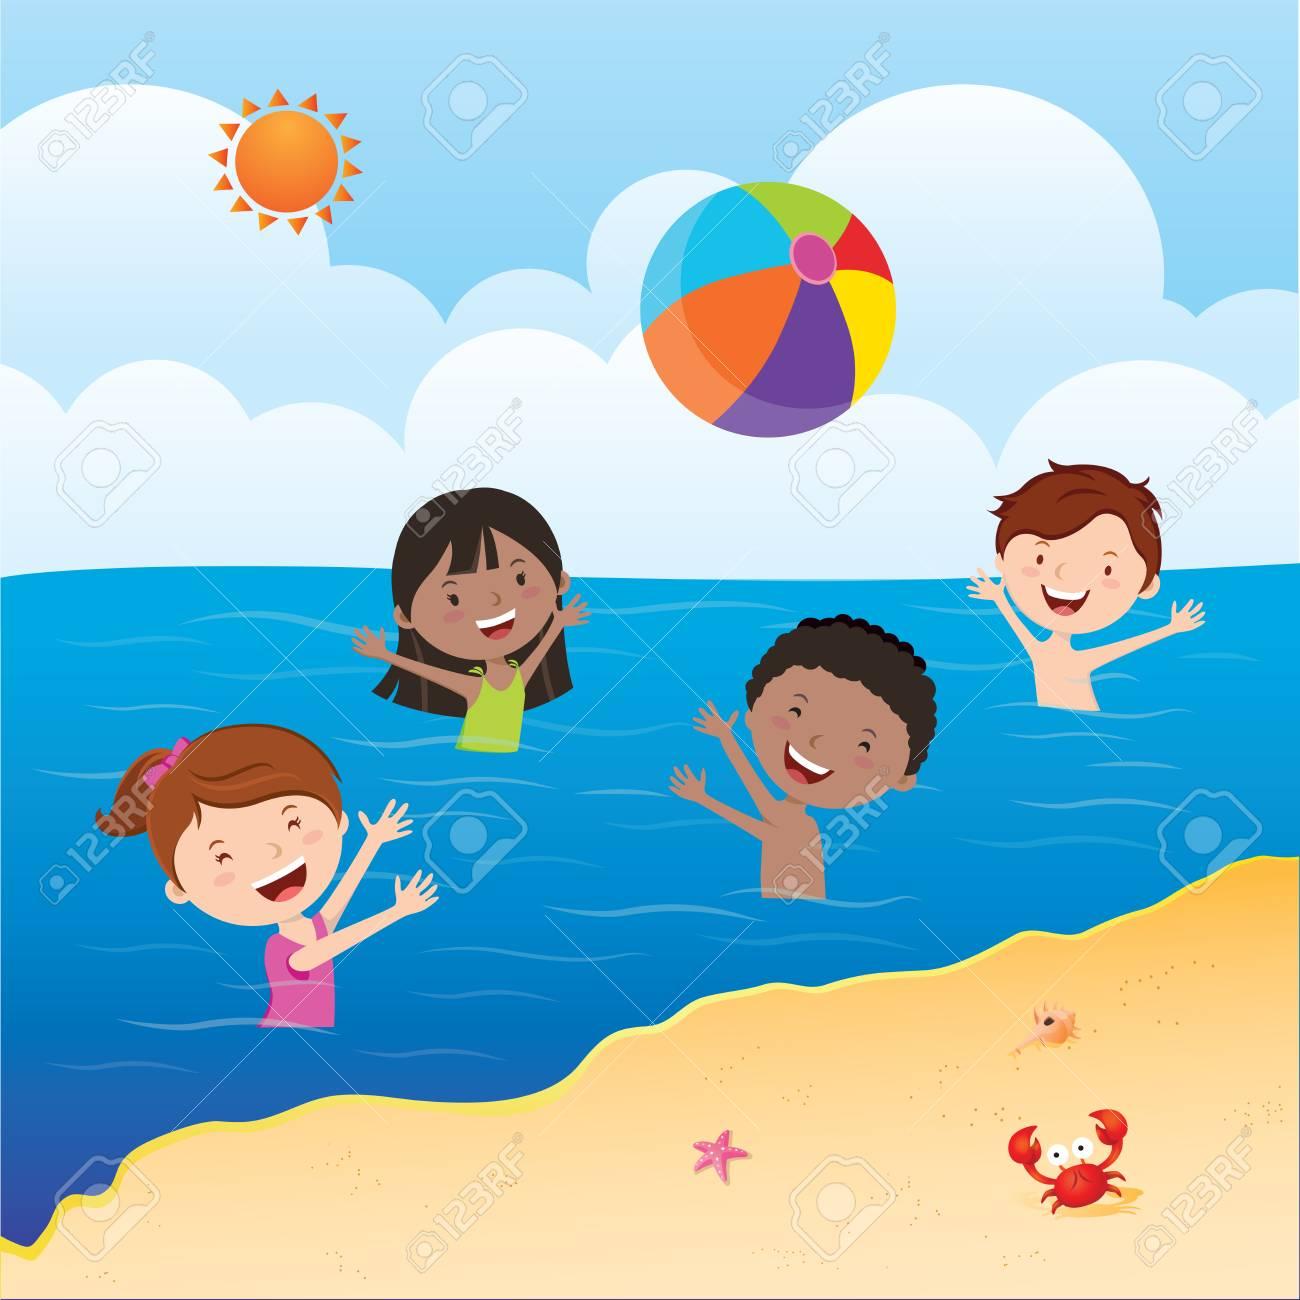 Kids playing beach ball. Happy kids playing beach ball in the...